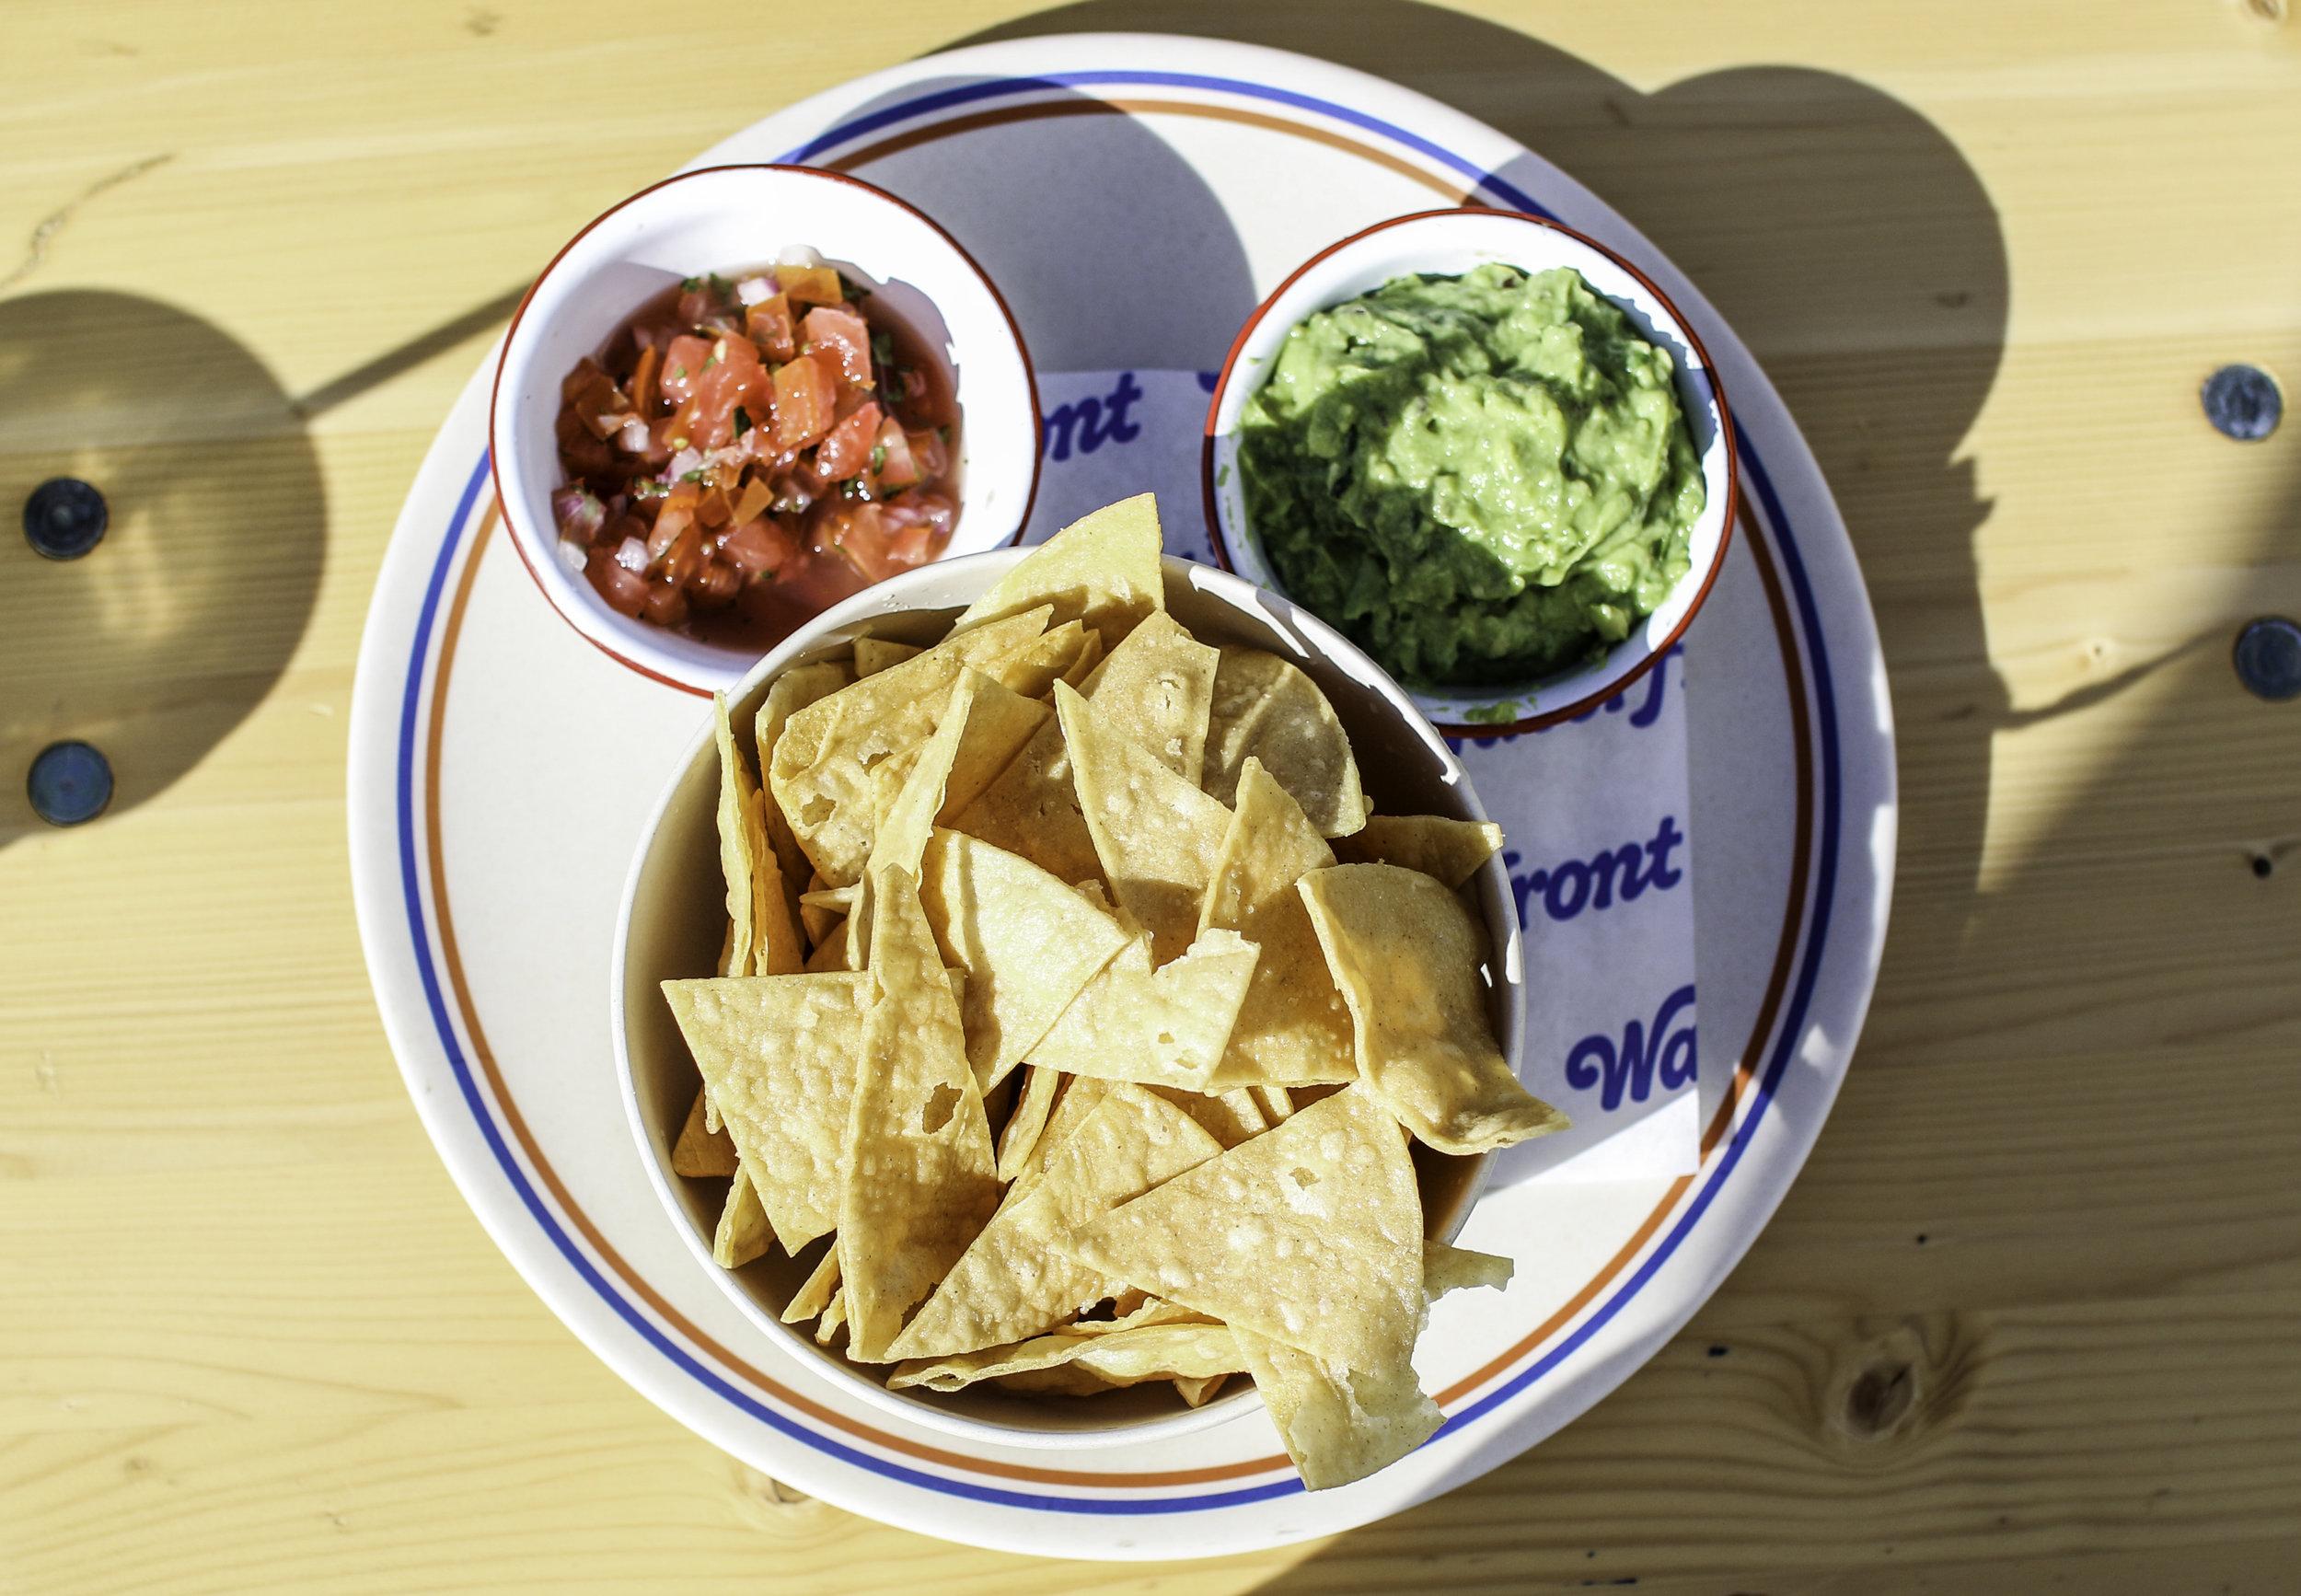 Chips + Guacamole